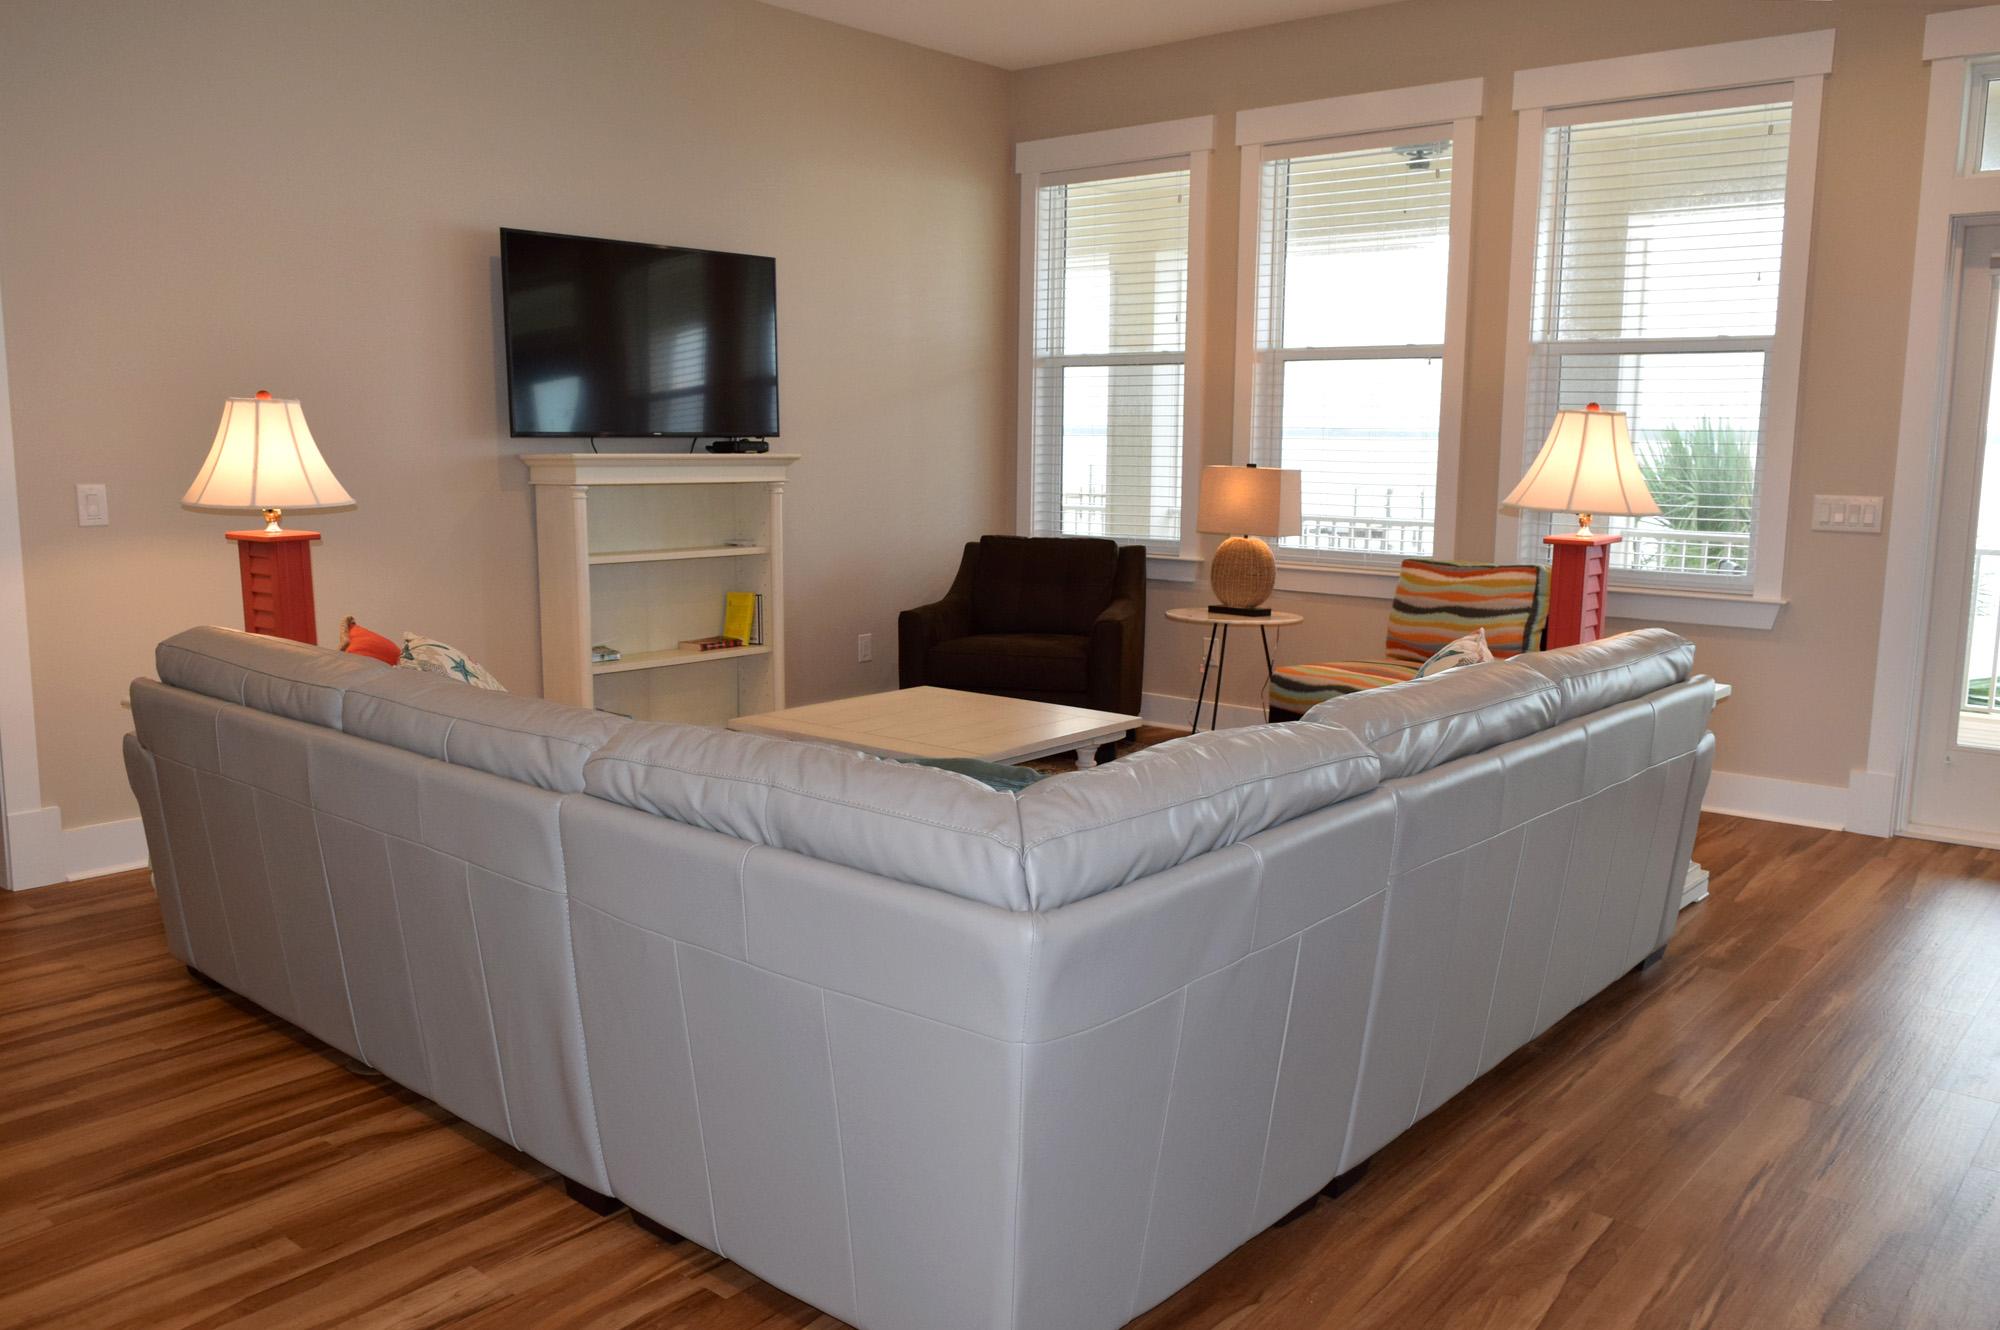 Panferio 337 House/Cottage rental in Pensacola Beach House Rentals in Pensacola Beach Florida - #9